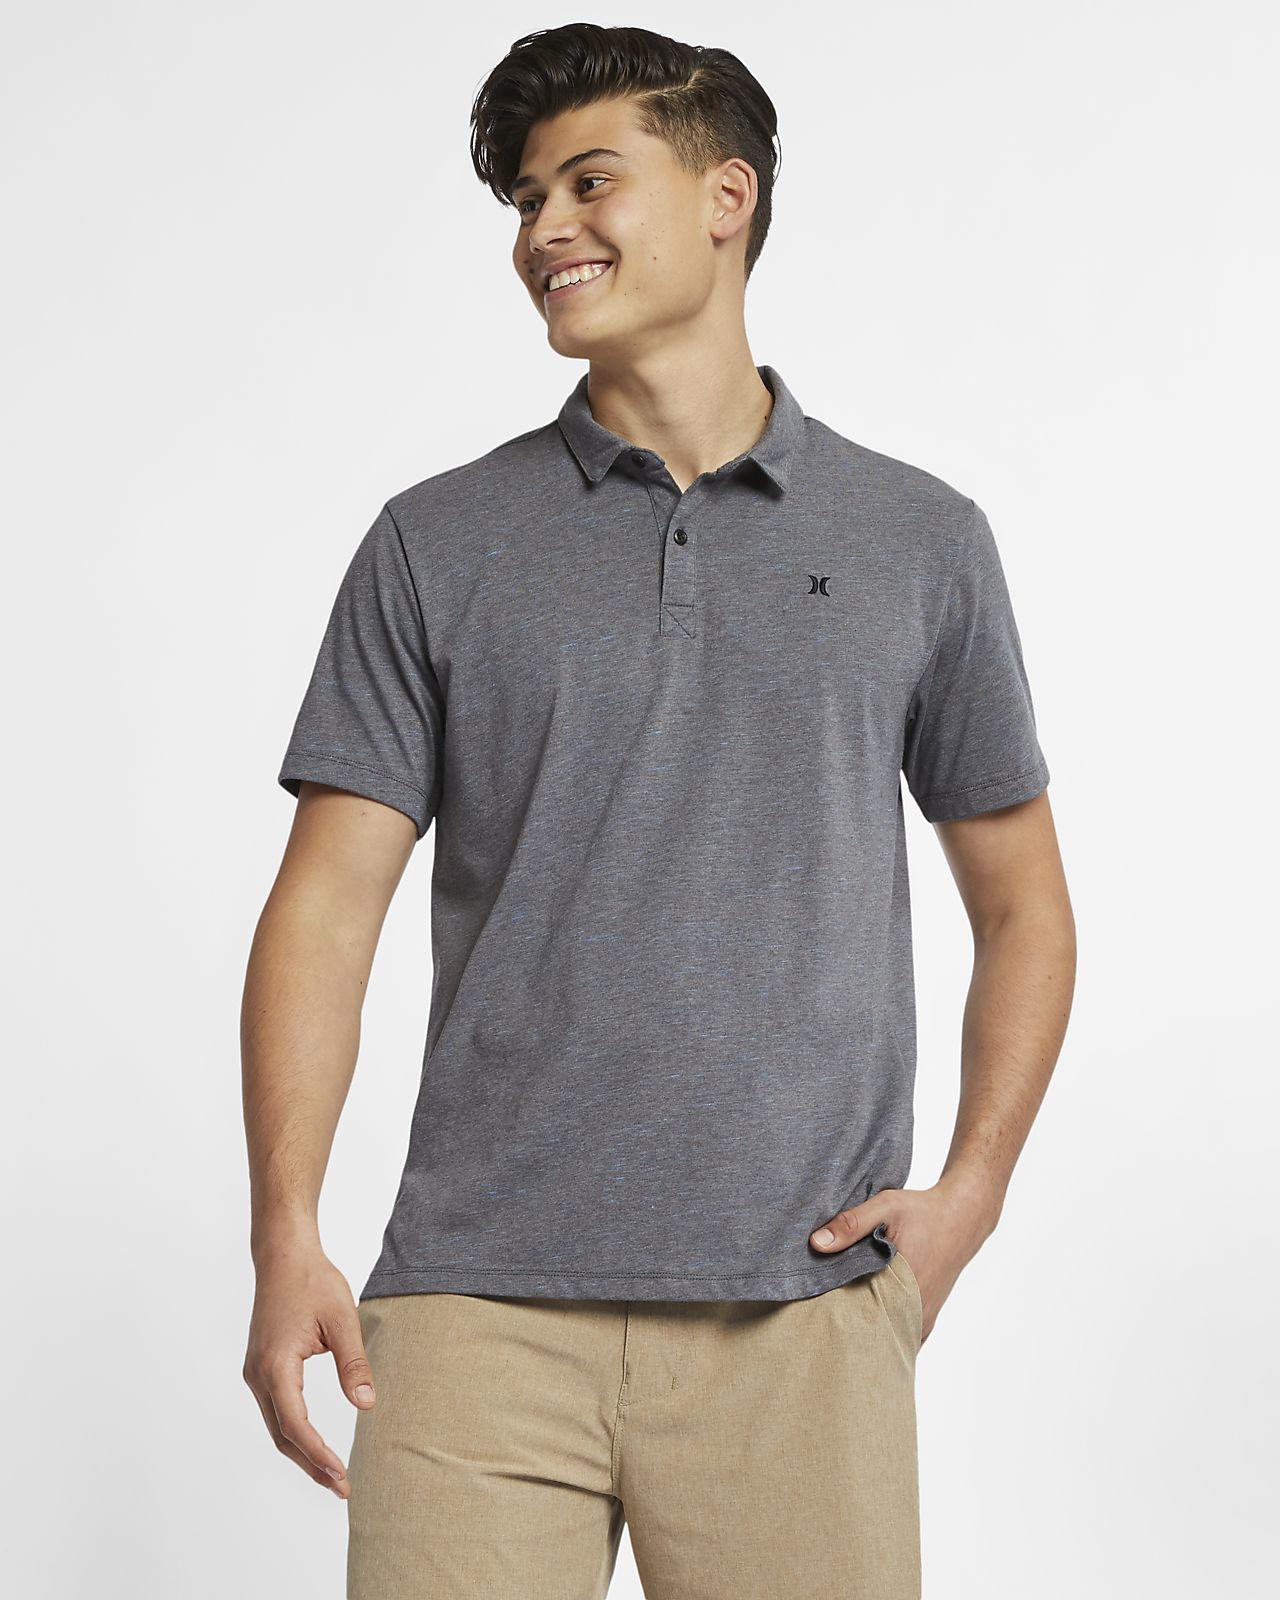 Hurley Dri-FIT Coronado Men's Short-Sleeve Polo